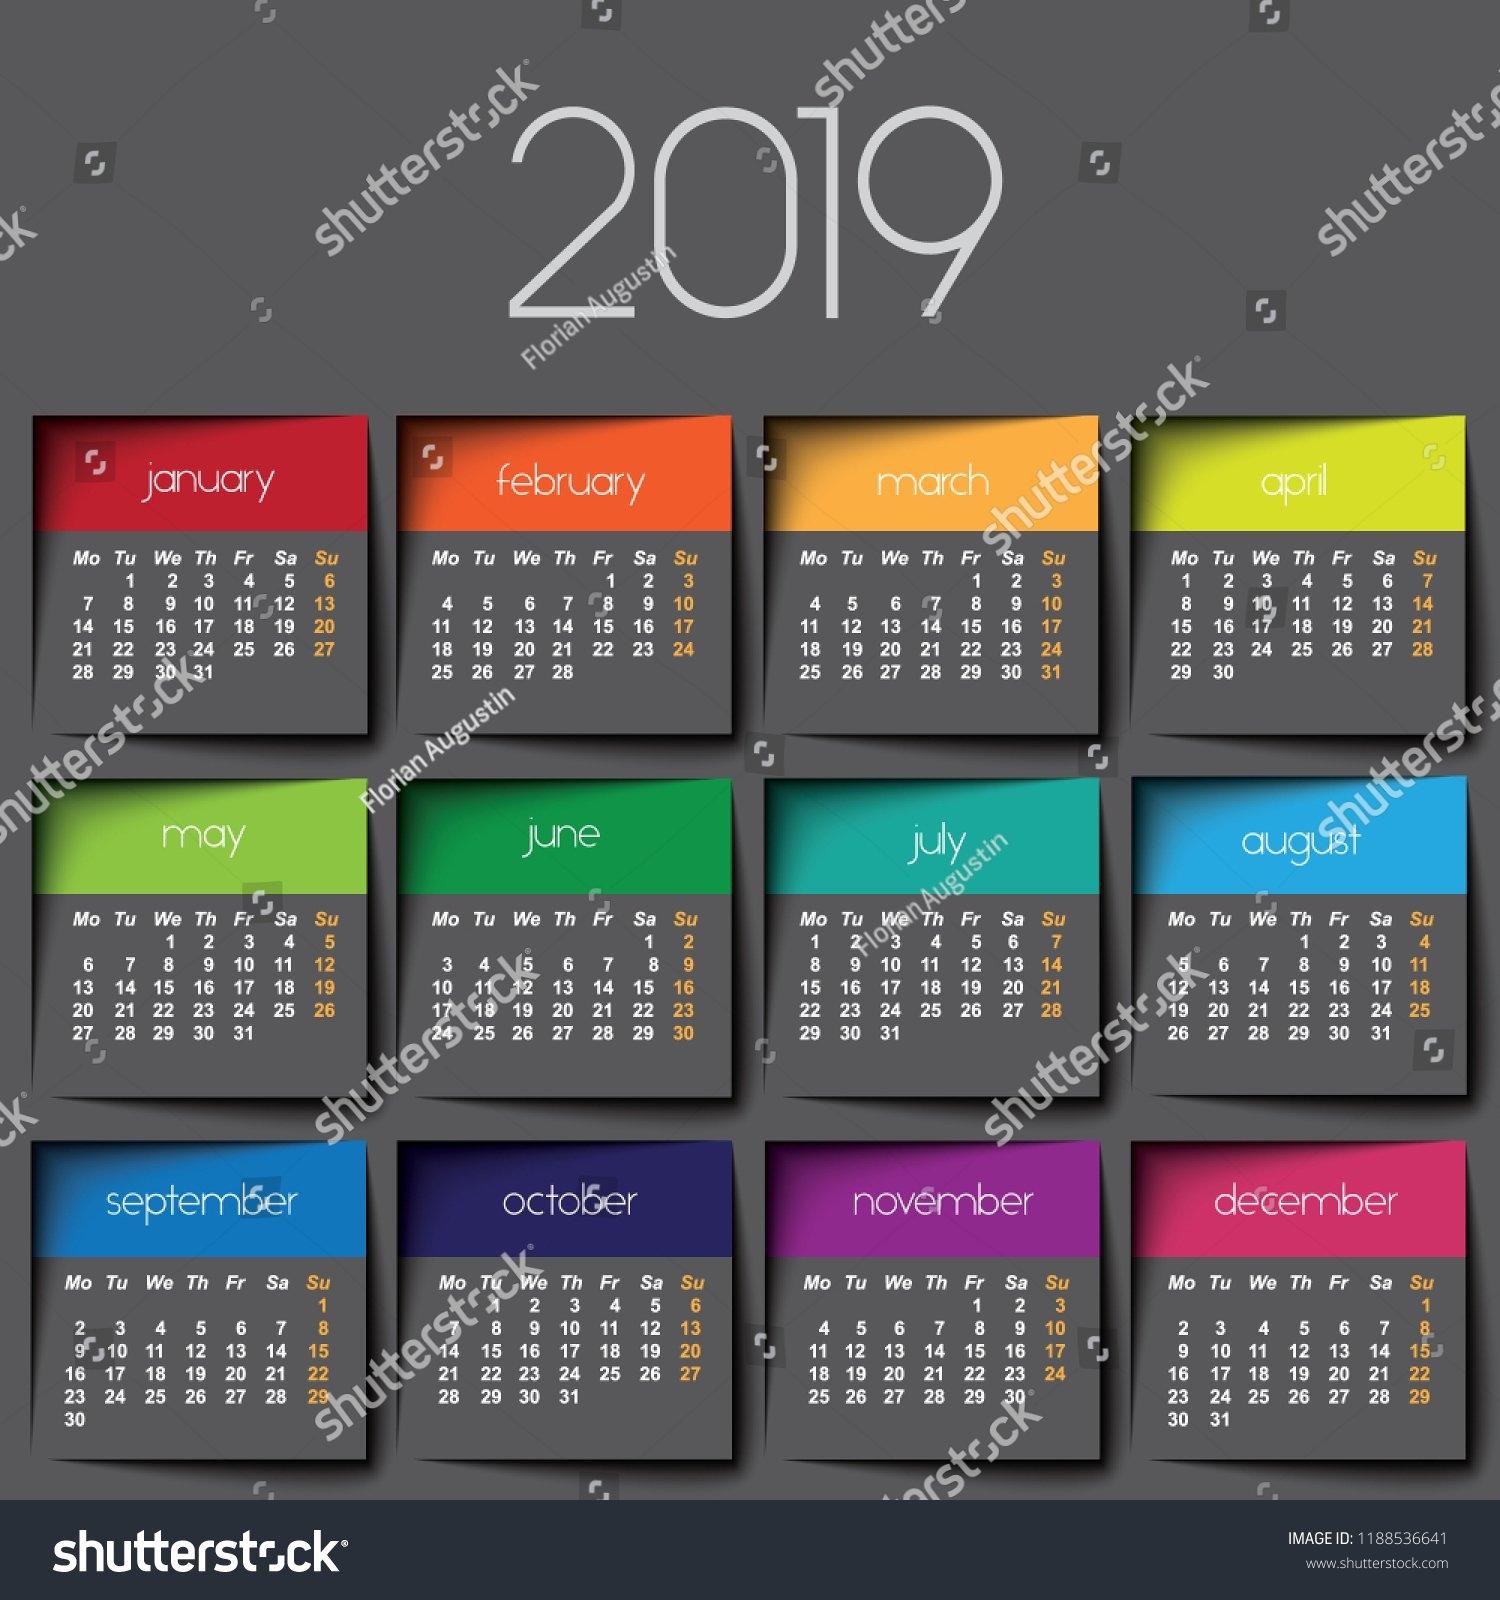 2019 Calendar Color Post Stock Vector (Royalty Free) 1188536641 J 2019 Calendar